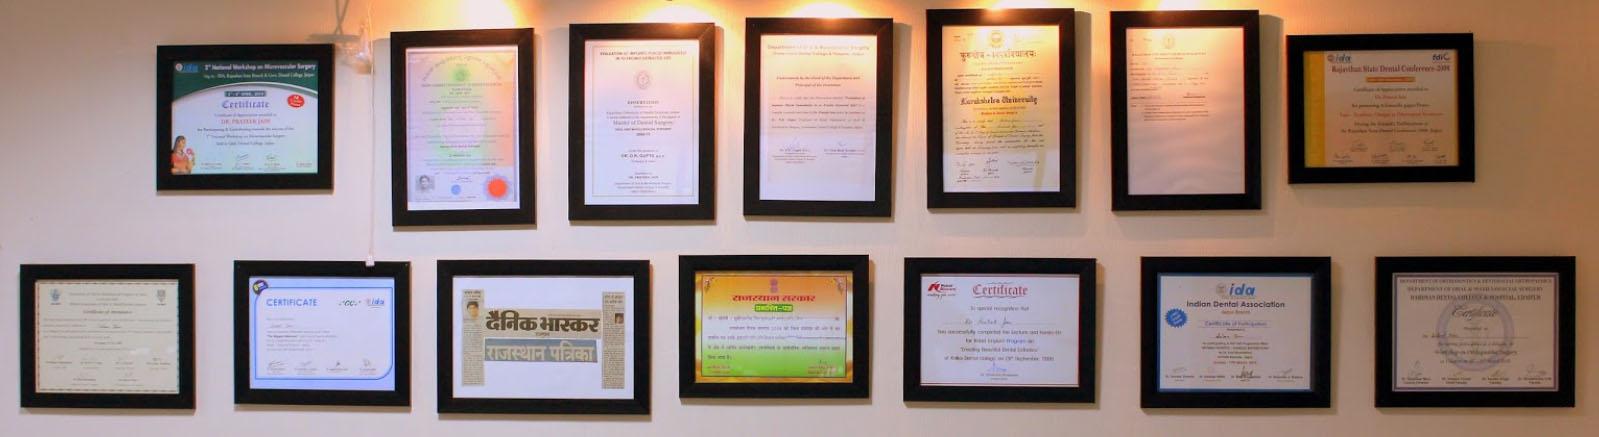 awards-facekraft-clininc-gallery